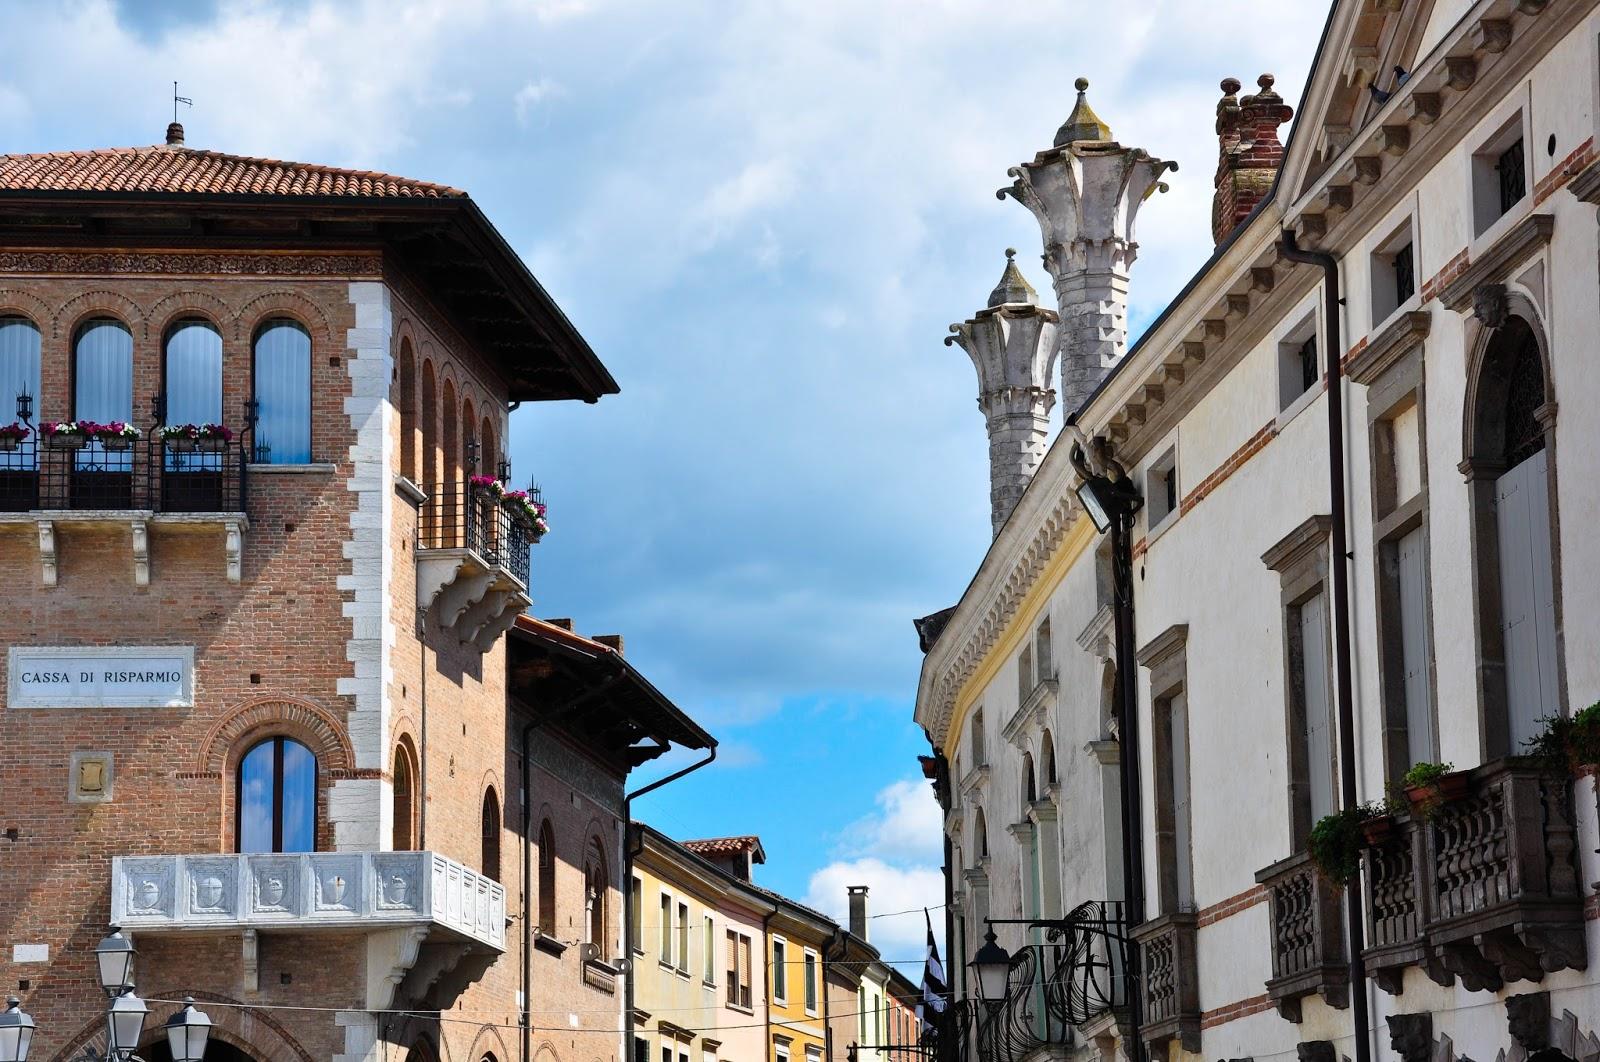 Houses in Montagnana, Veneto, Italy - www.rossiwrites.com